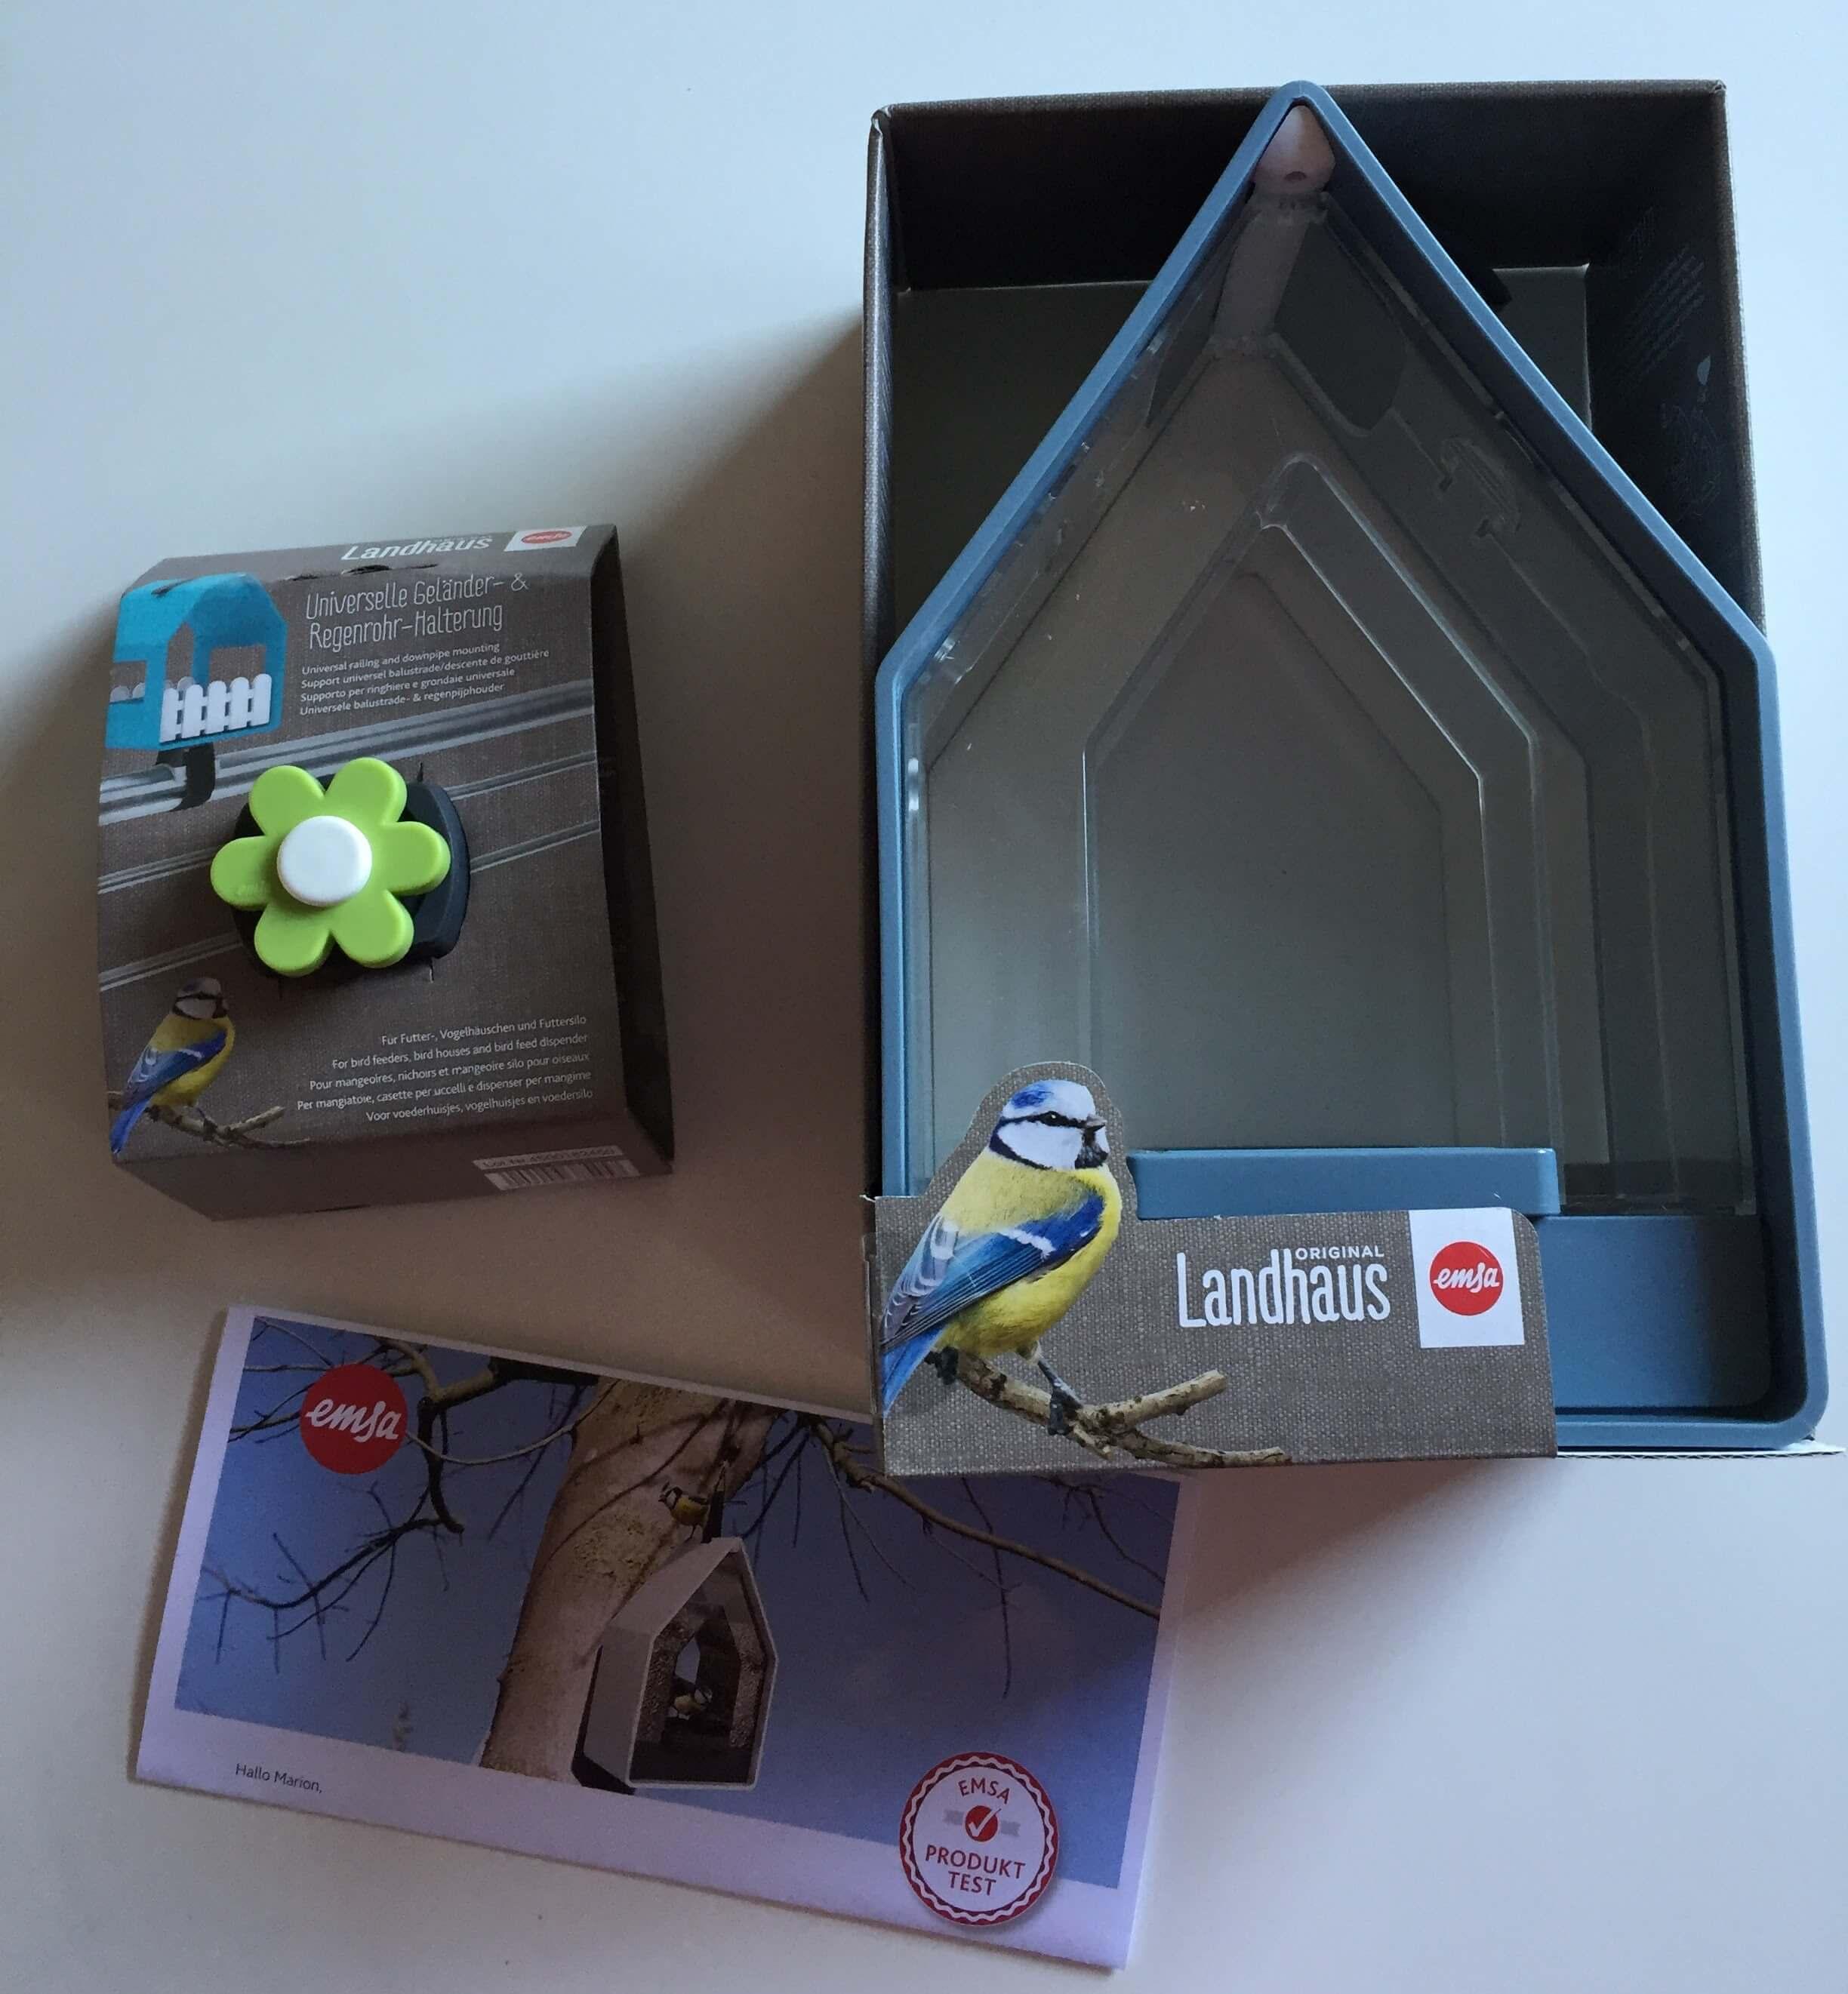 Paketinhalt Emsa Produktest Landhaus